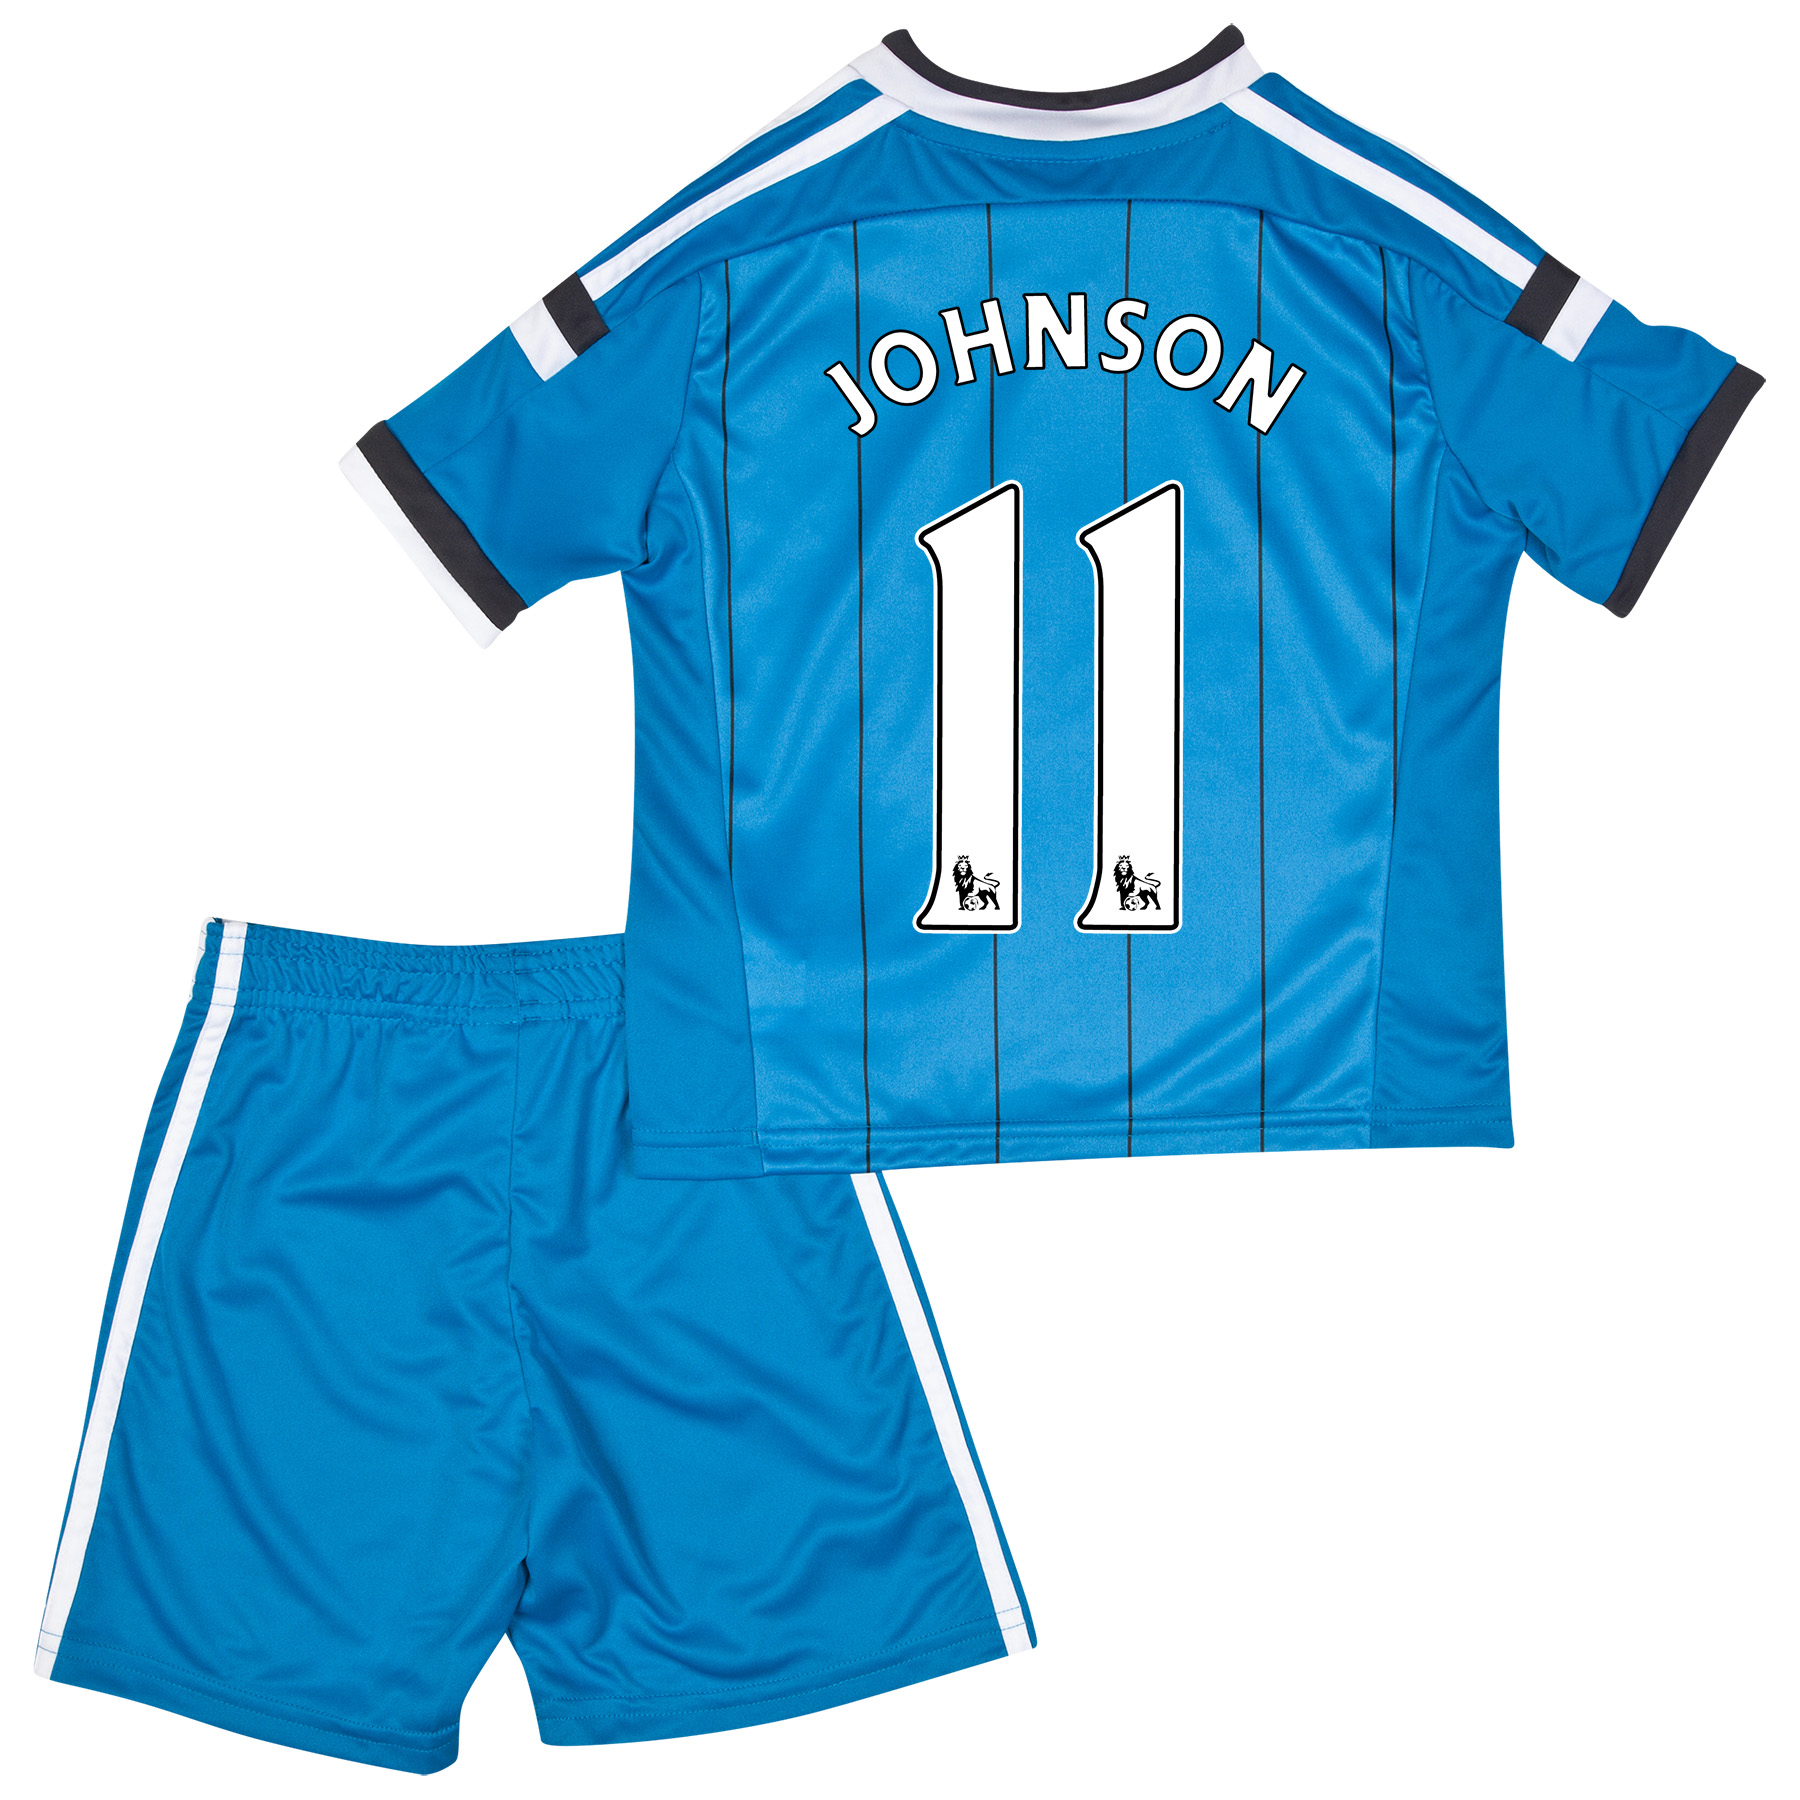 Sunderland Away Mini Kit 2014/15 Lt Blue with Johnson 11 printing